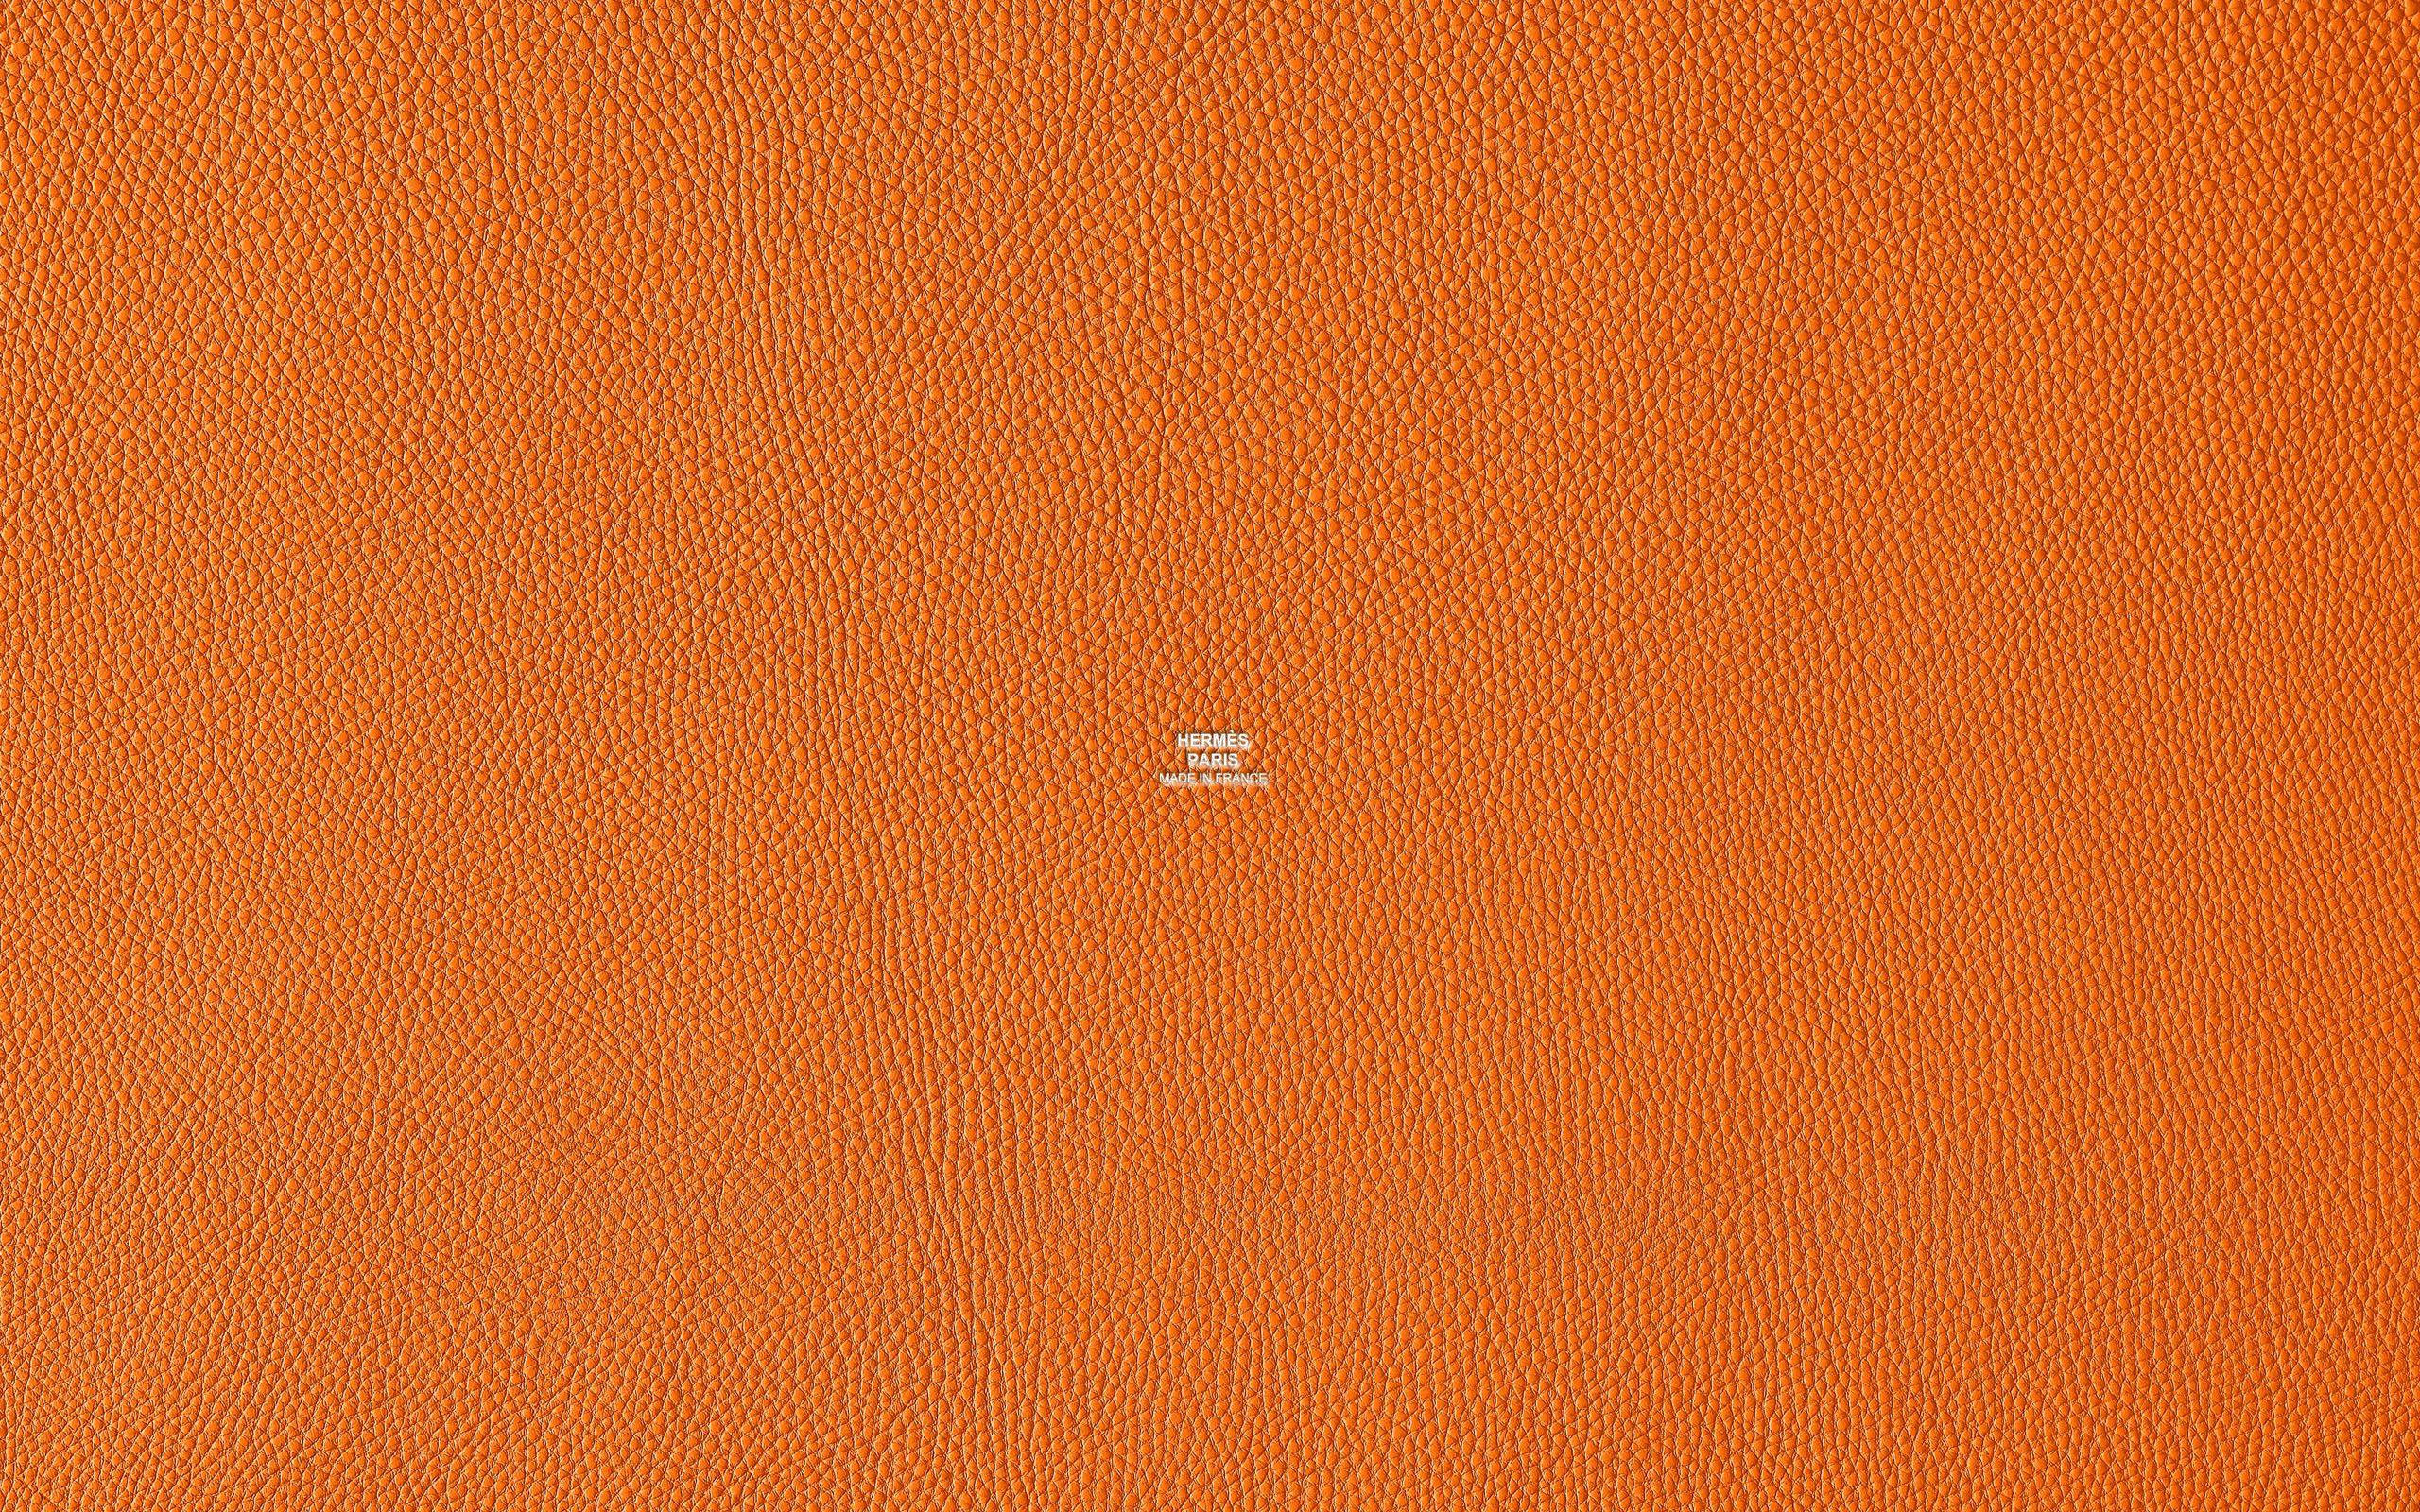 hermes embossed orange aa pinterest. Black Bedroom Furniture Sets. Home Design Ideas